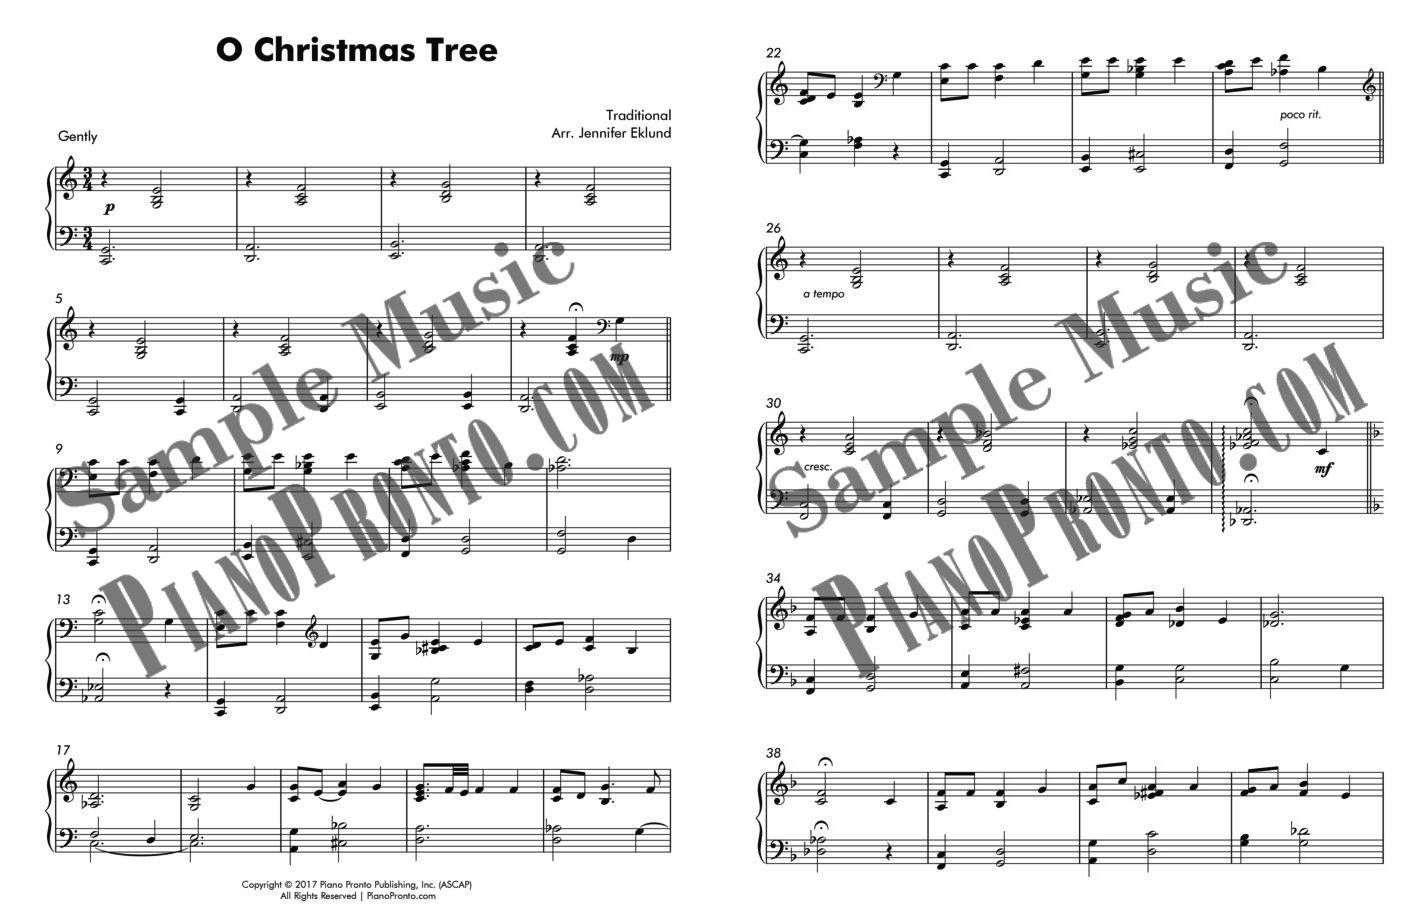 O Christmas Tree - Jazzy Holiday Solo